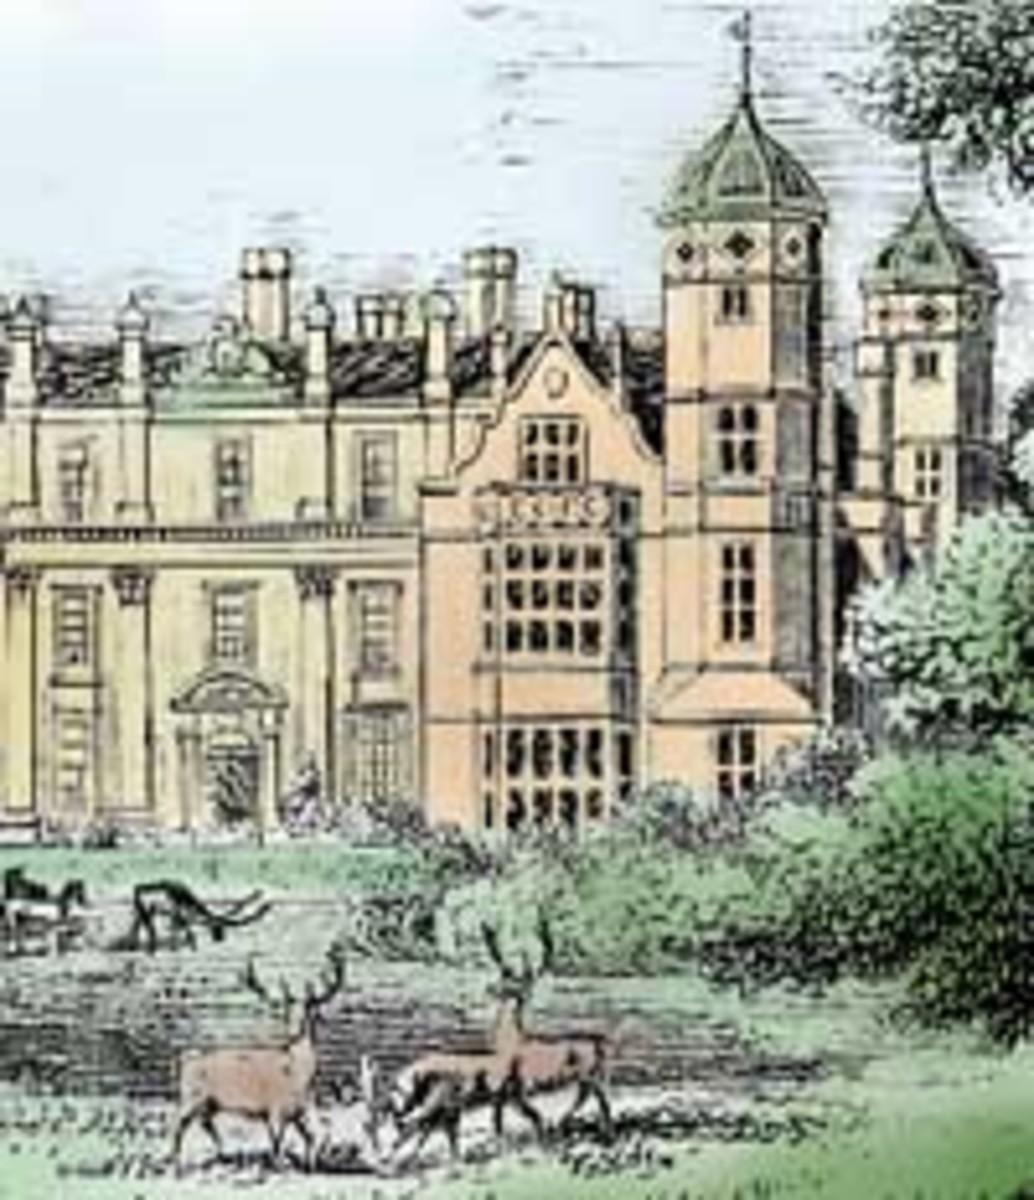 Cobham Hall Gravesend